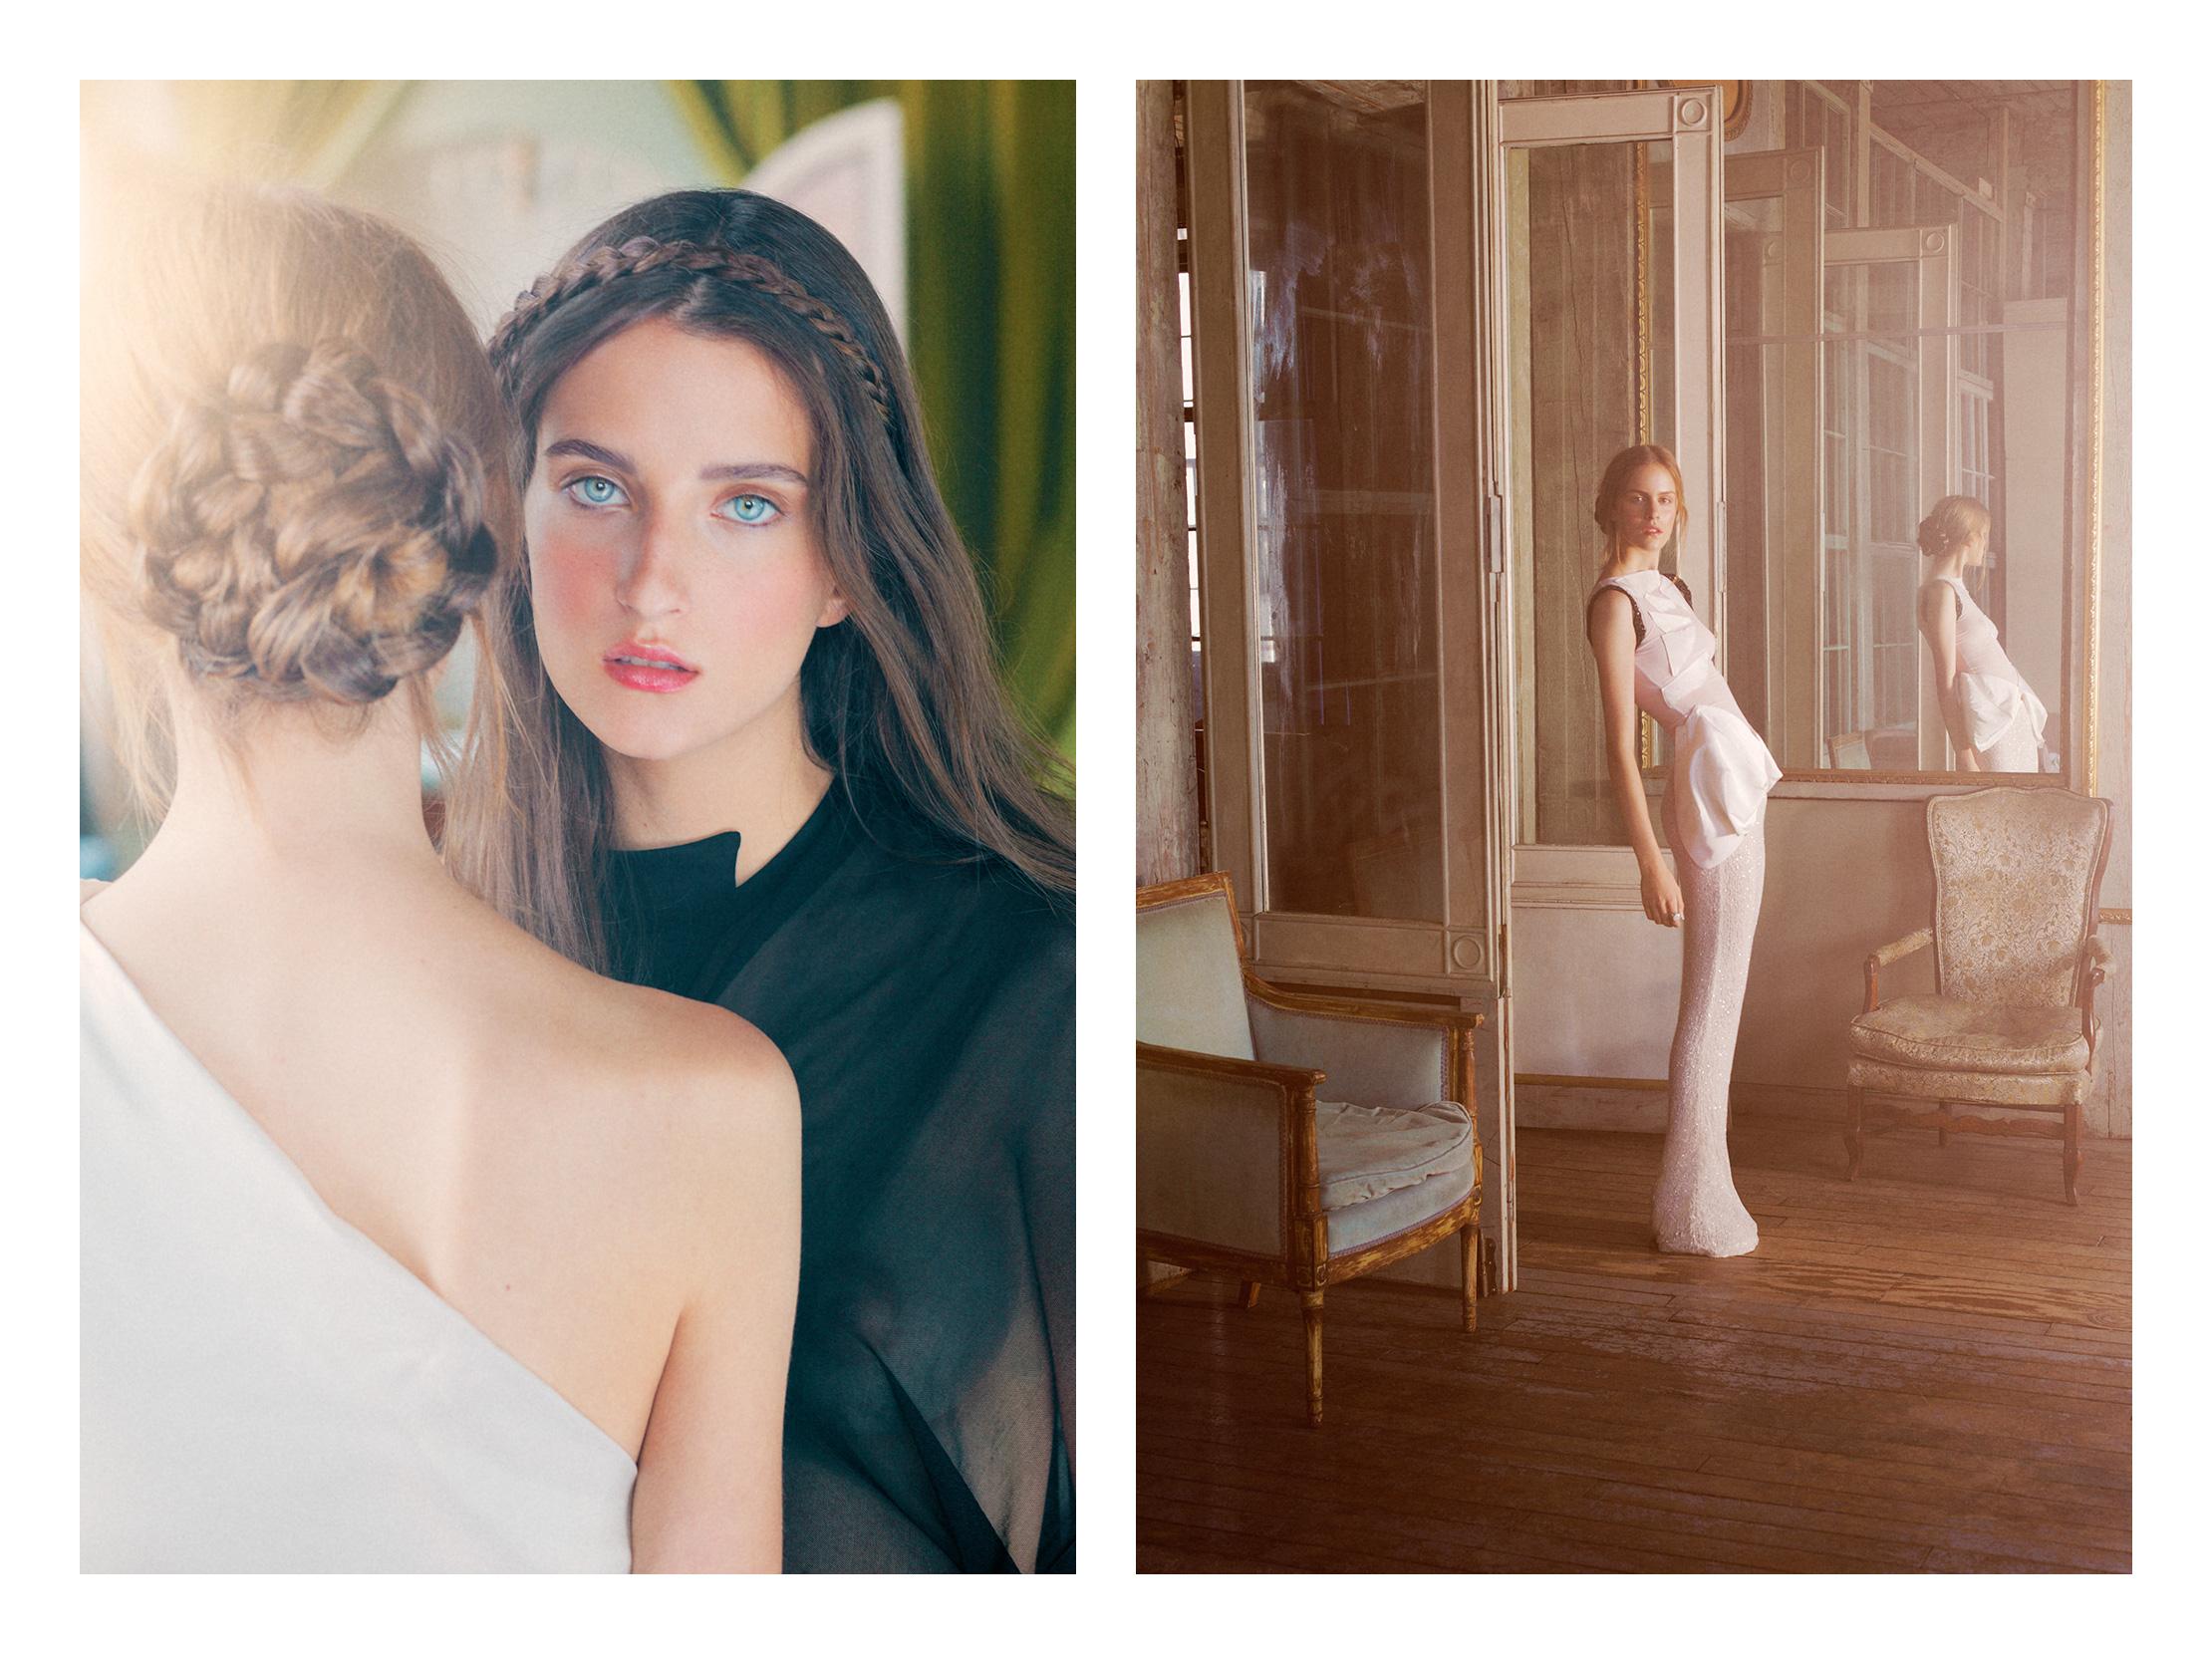 Another You fashion editorial by Nikola Tamindzic 7883.jpg